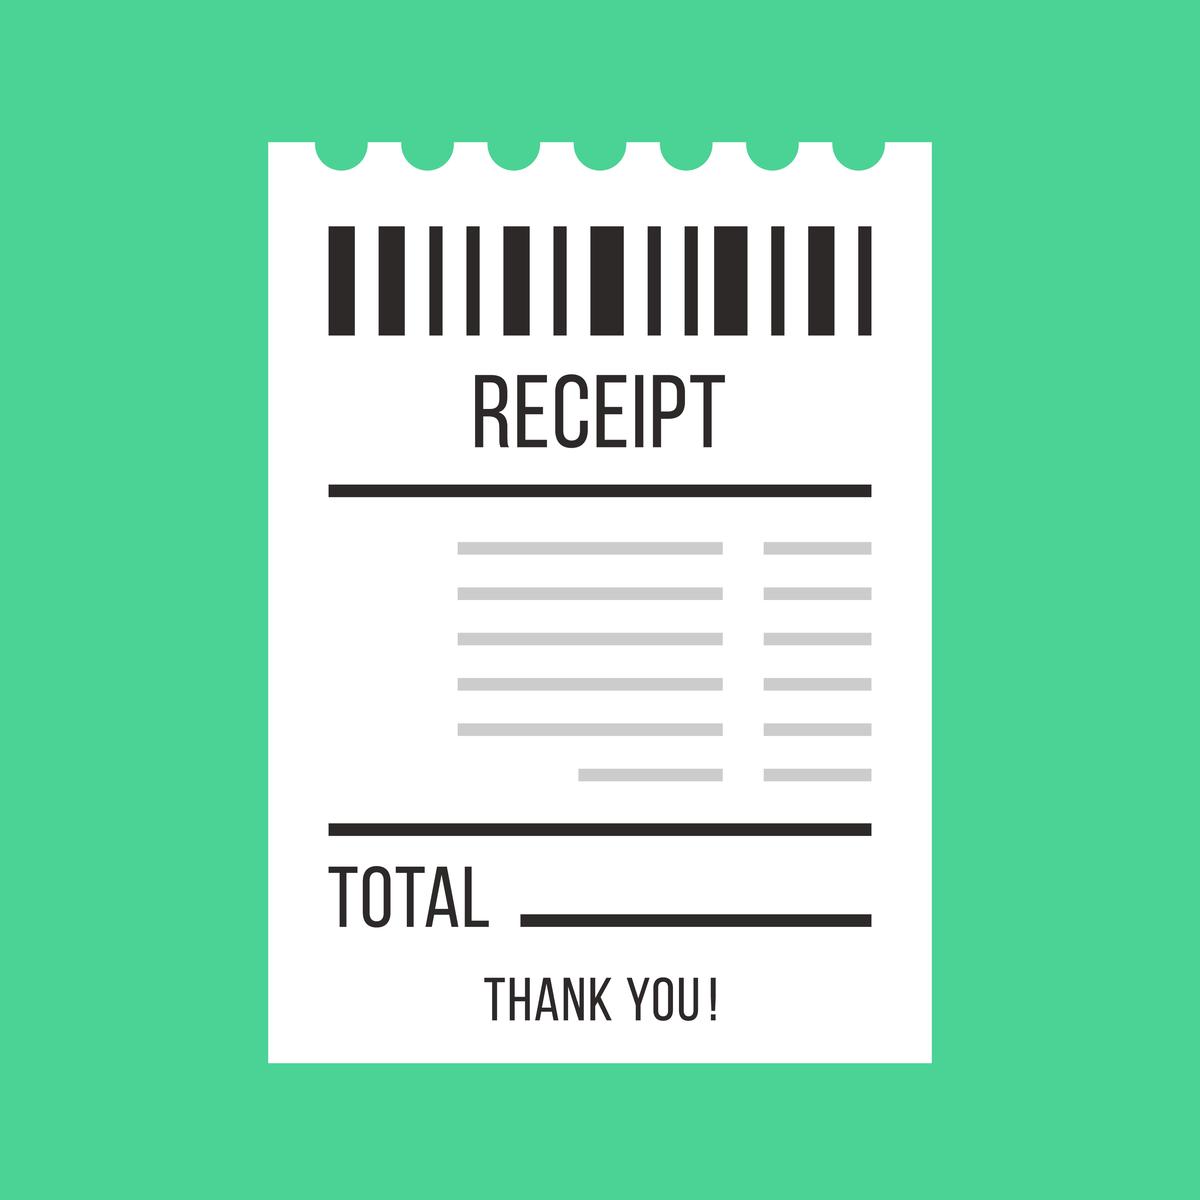 giving-receipt-green.png